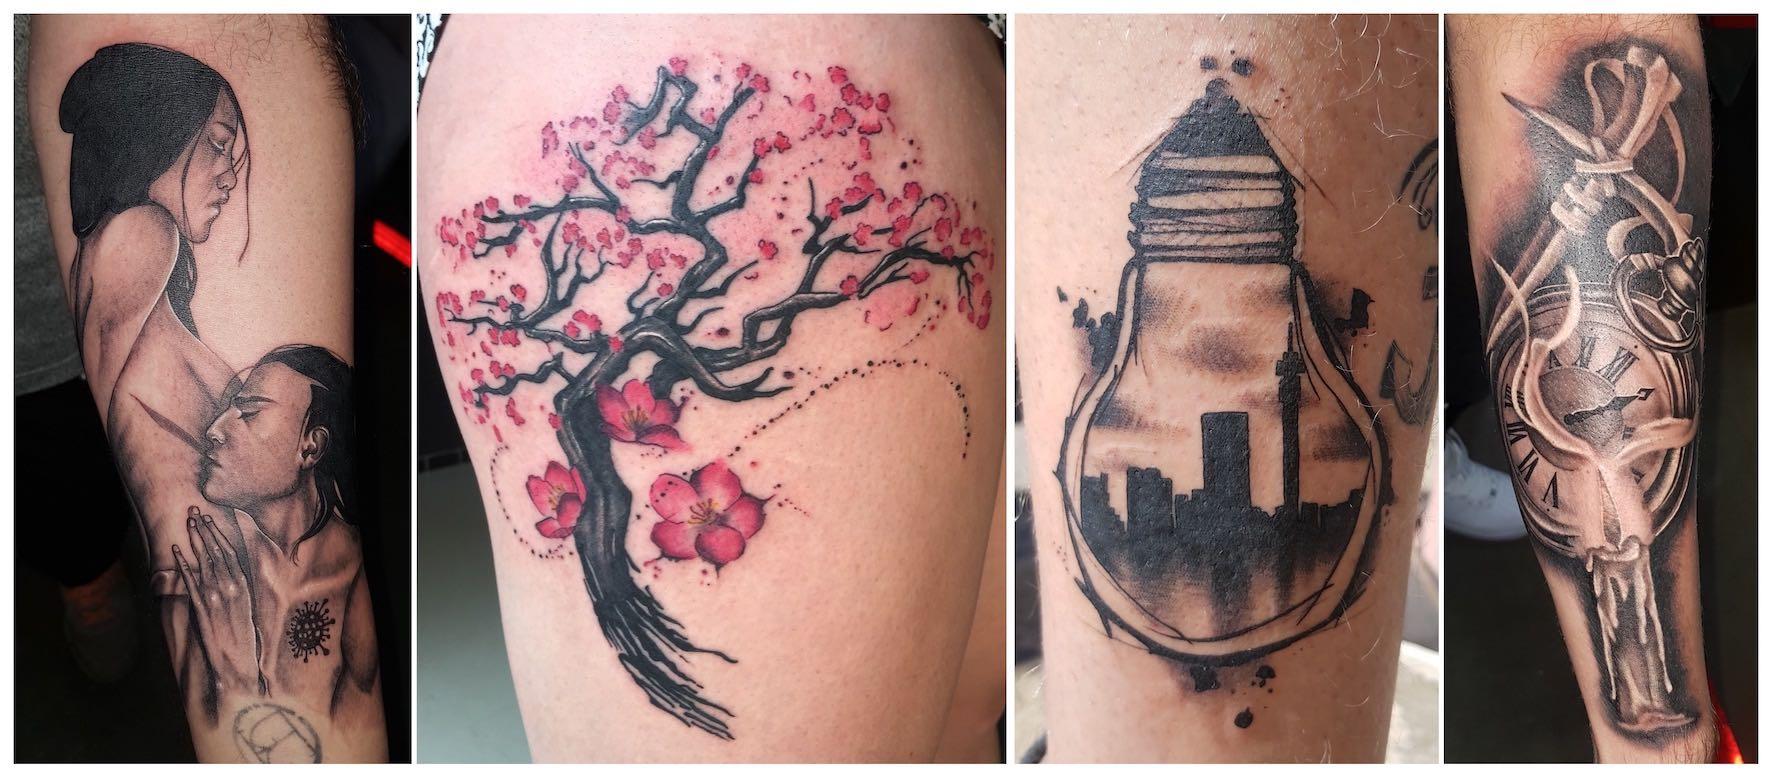 Tattoos done by Brad Pretorius of Royal Ink